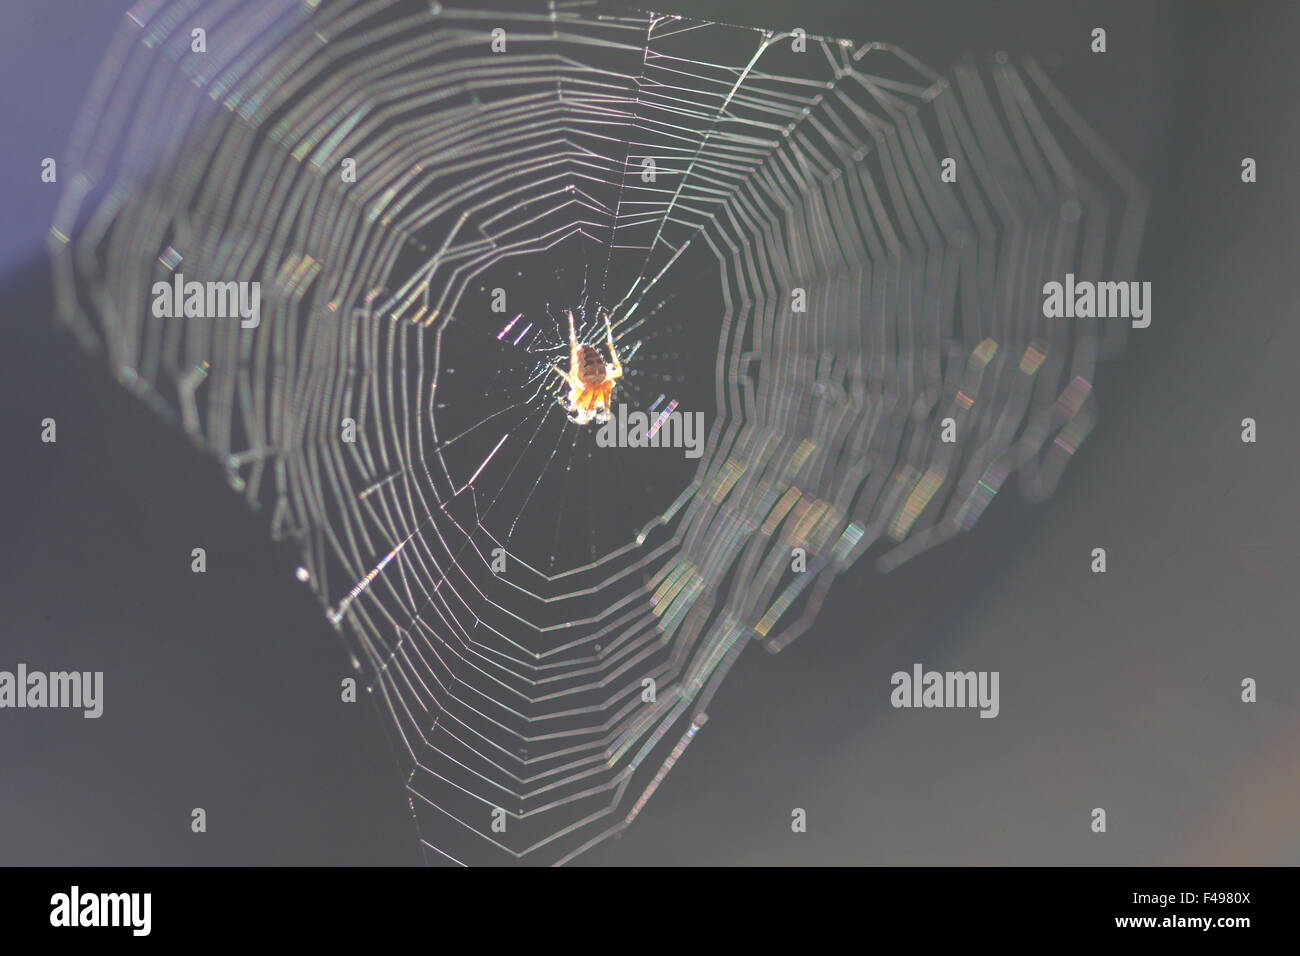 Spider-web - Stock Image